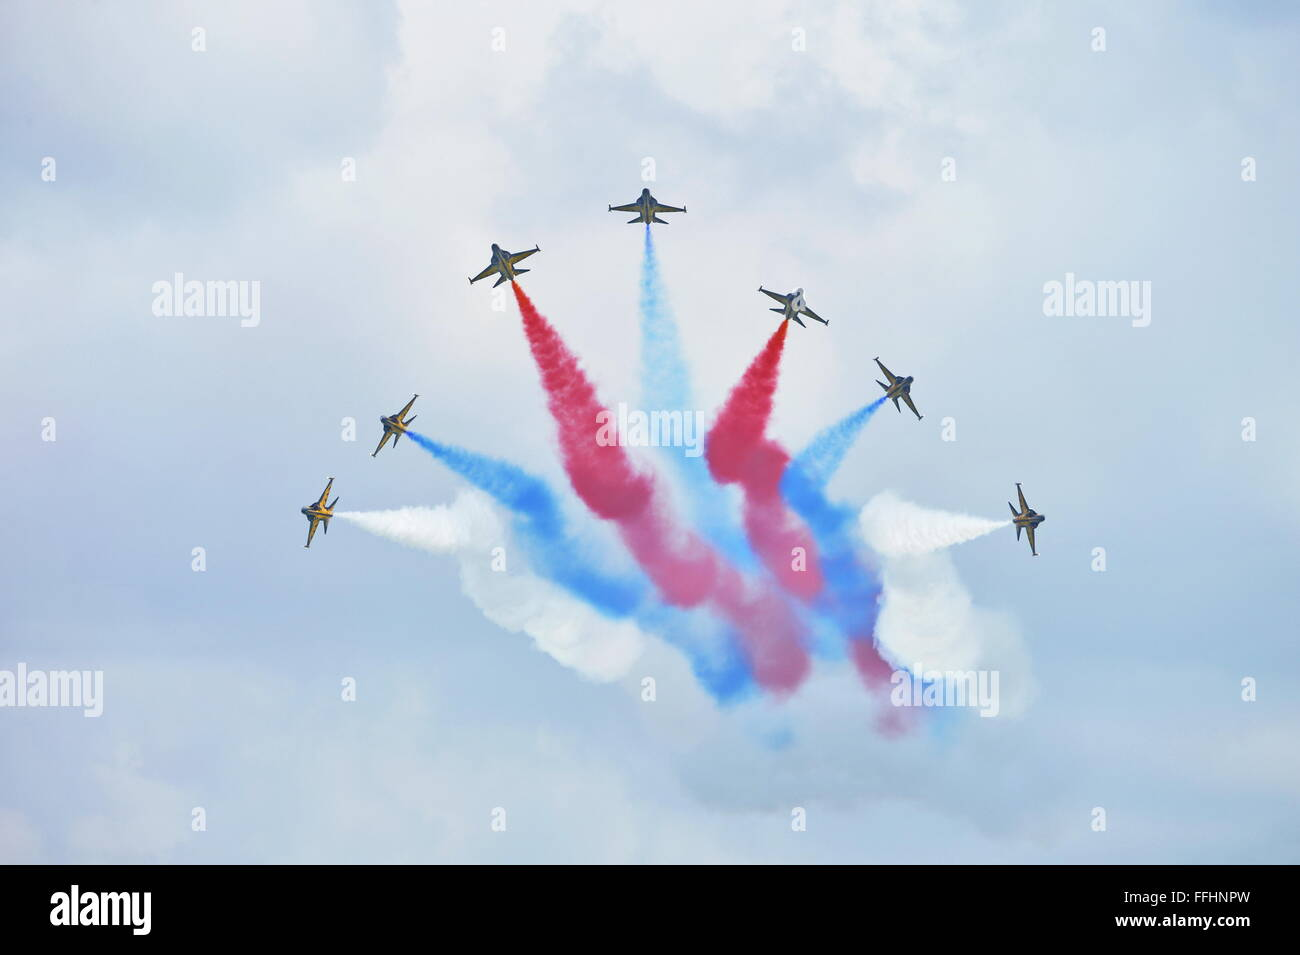 Black Eagles, (T-50B), aerobatics team, Singapore Airshow 2016, Republic of Korea Air Force RoKAF https://www.singaporeairshow.com/aerobatic - Stock Image